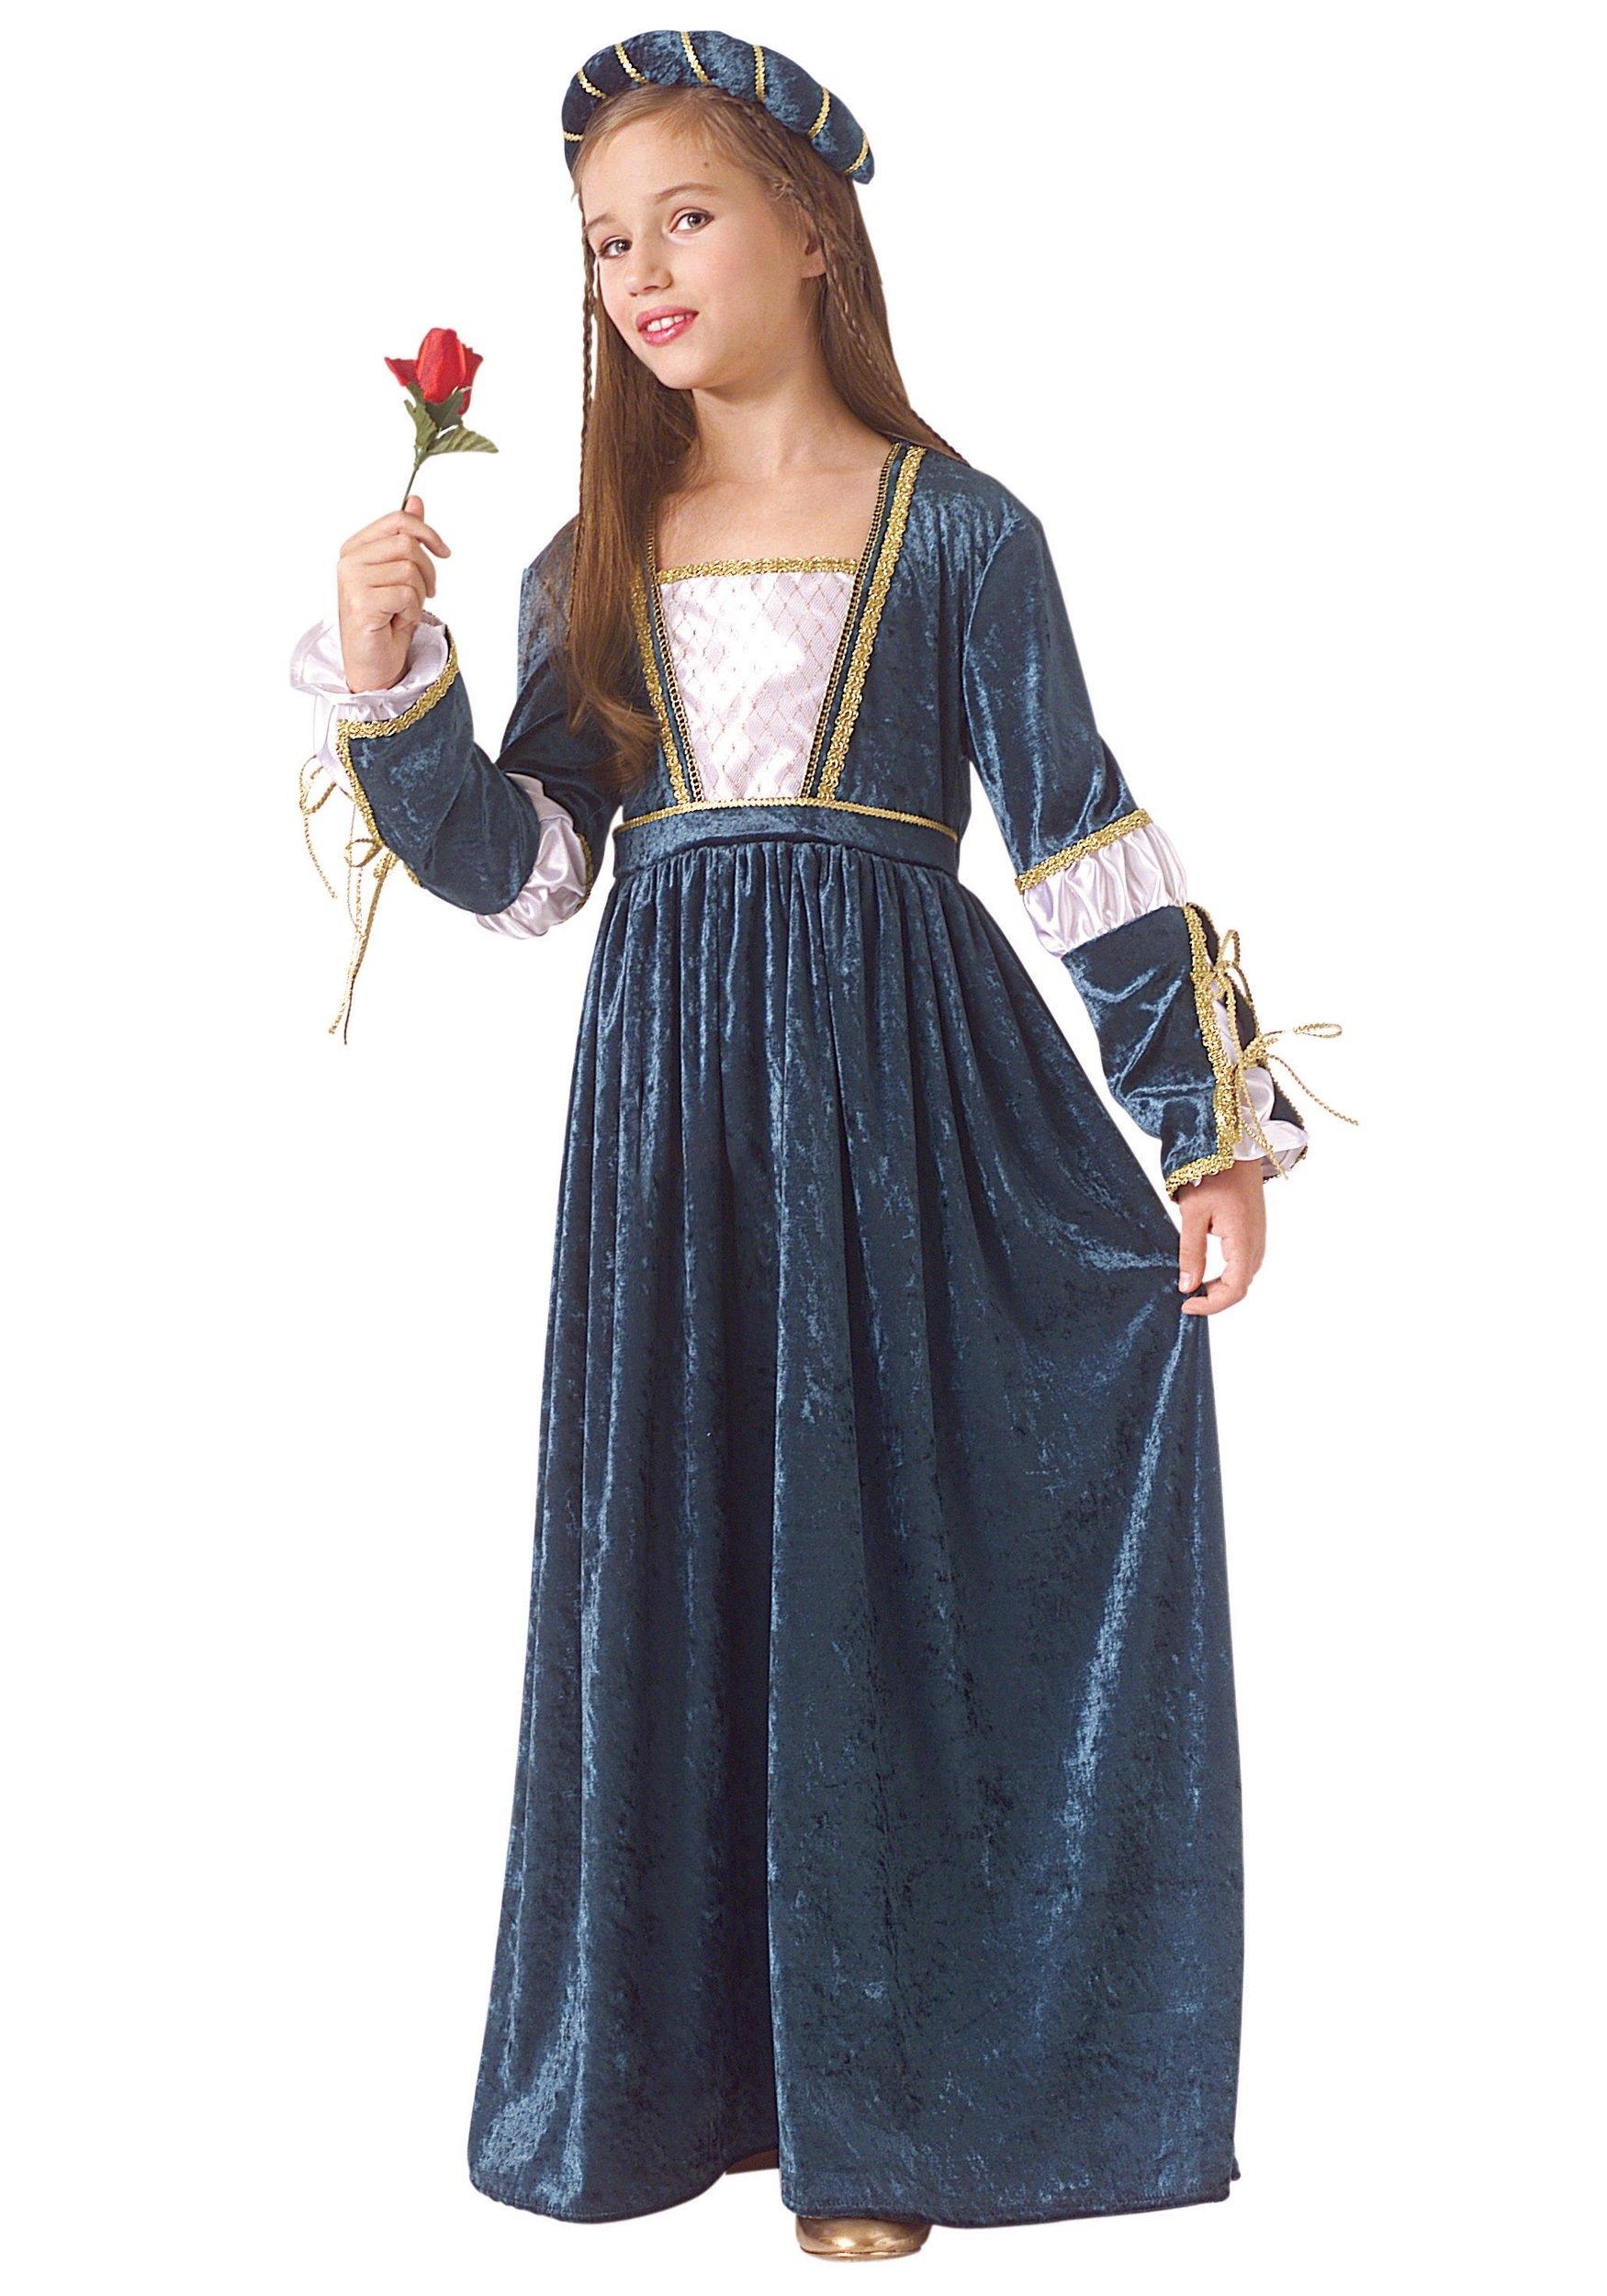 10 Fabulous Romeo And Juliet Costume Ideas child juliet costume 2020